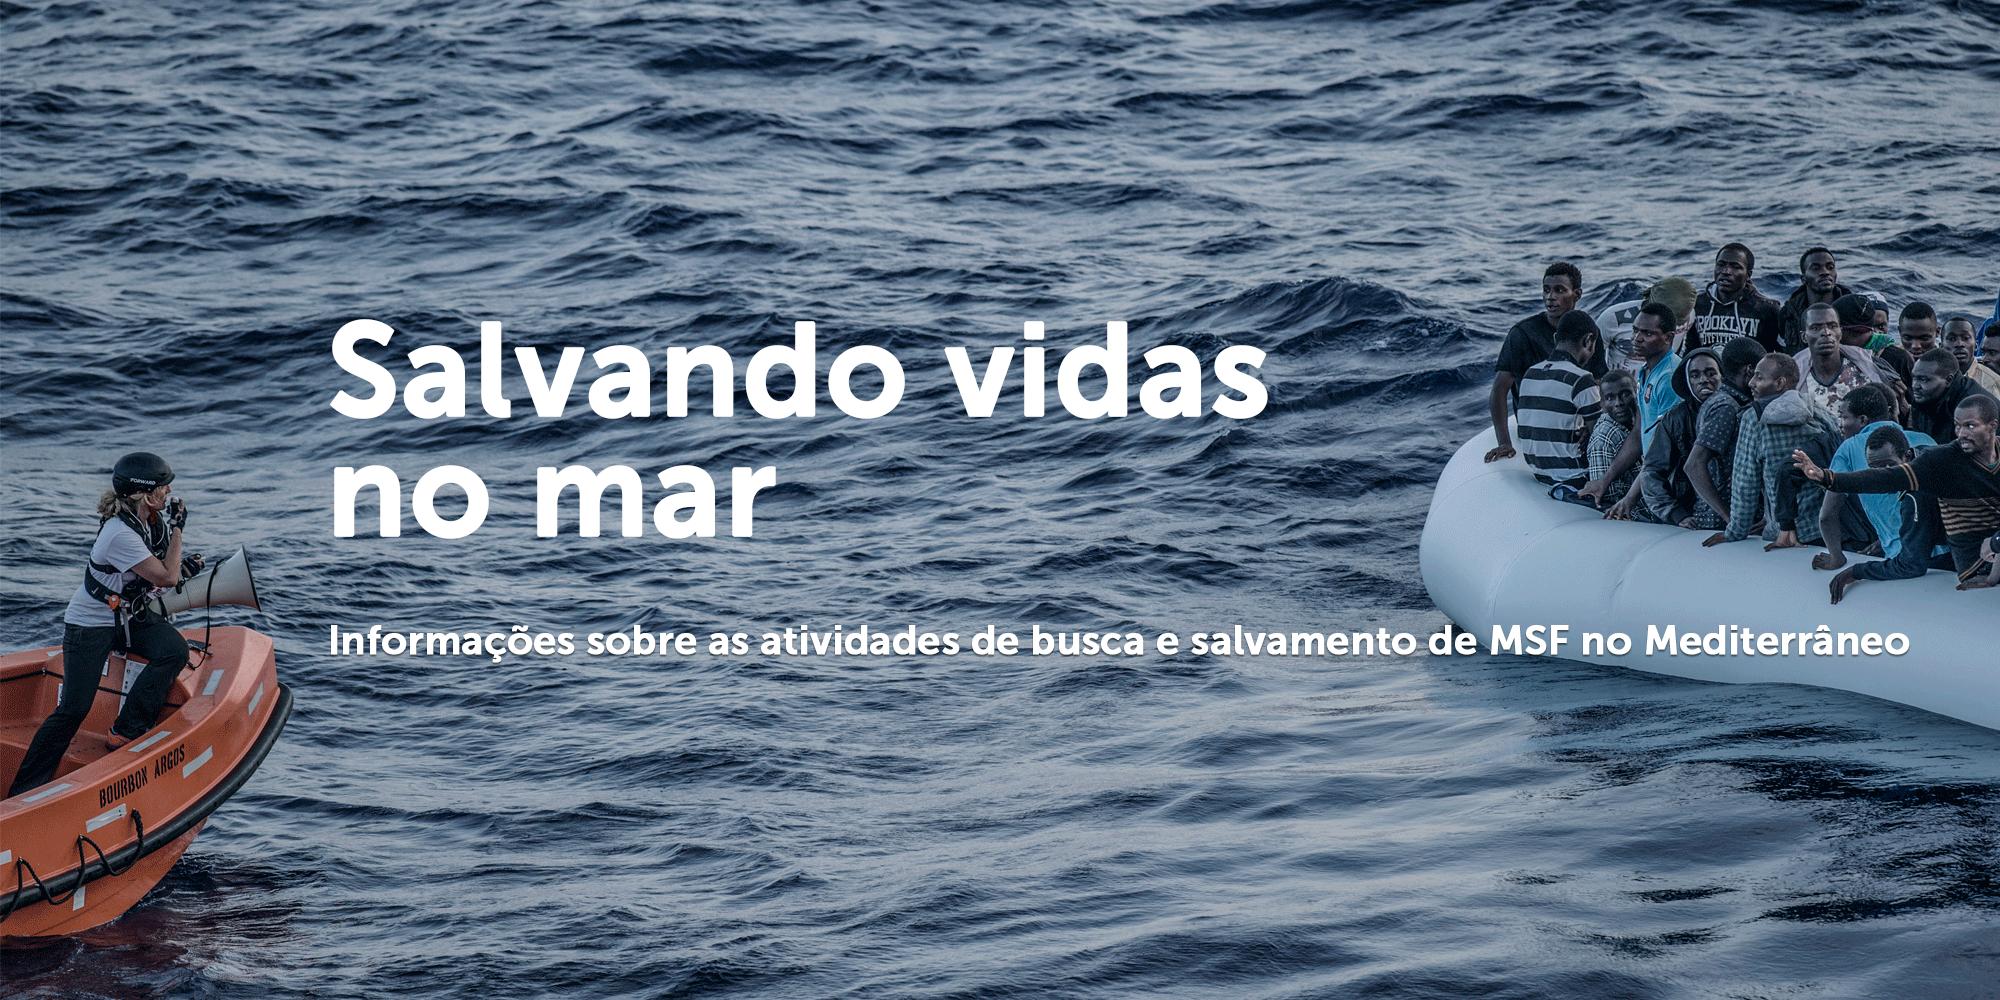 Salvando vidas no mar